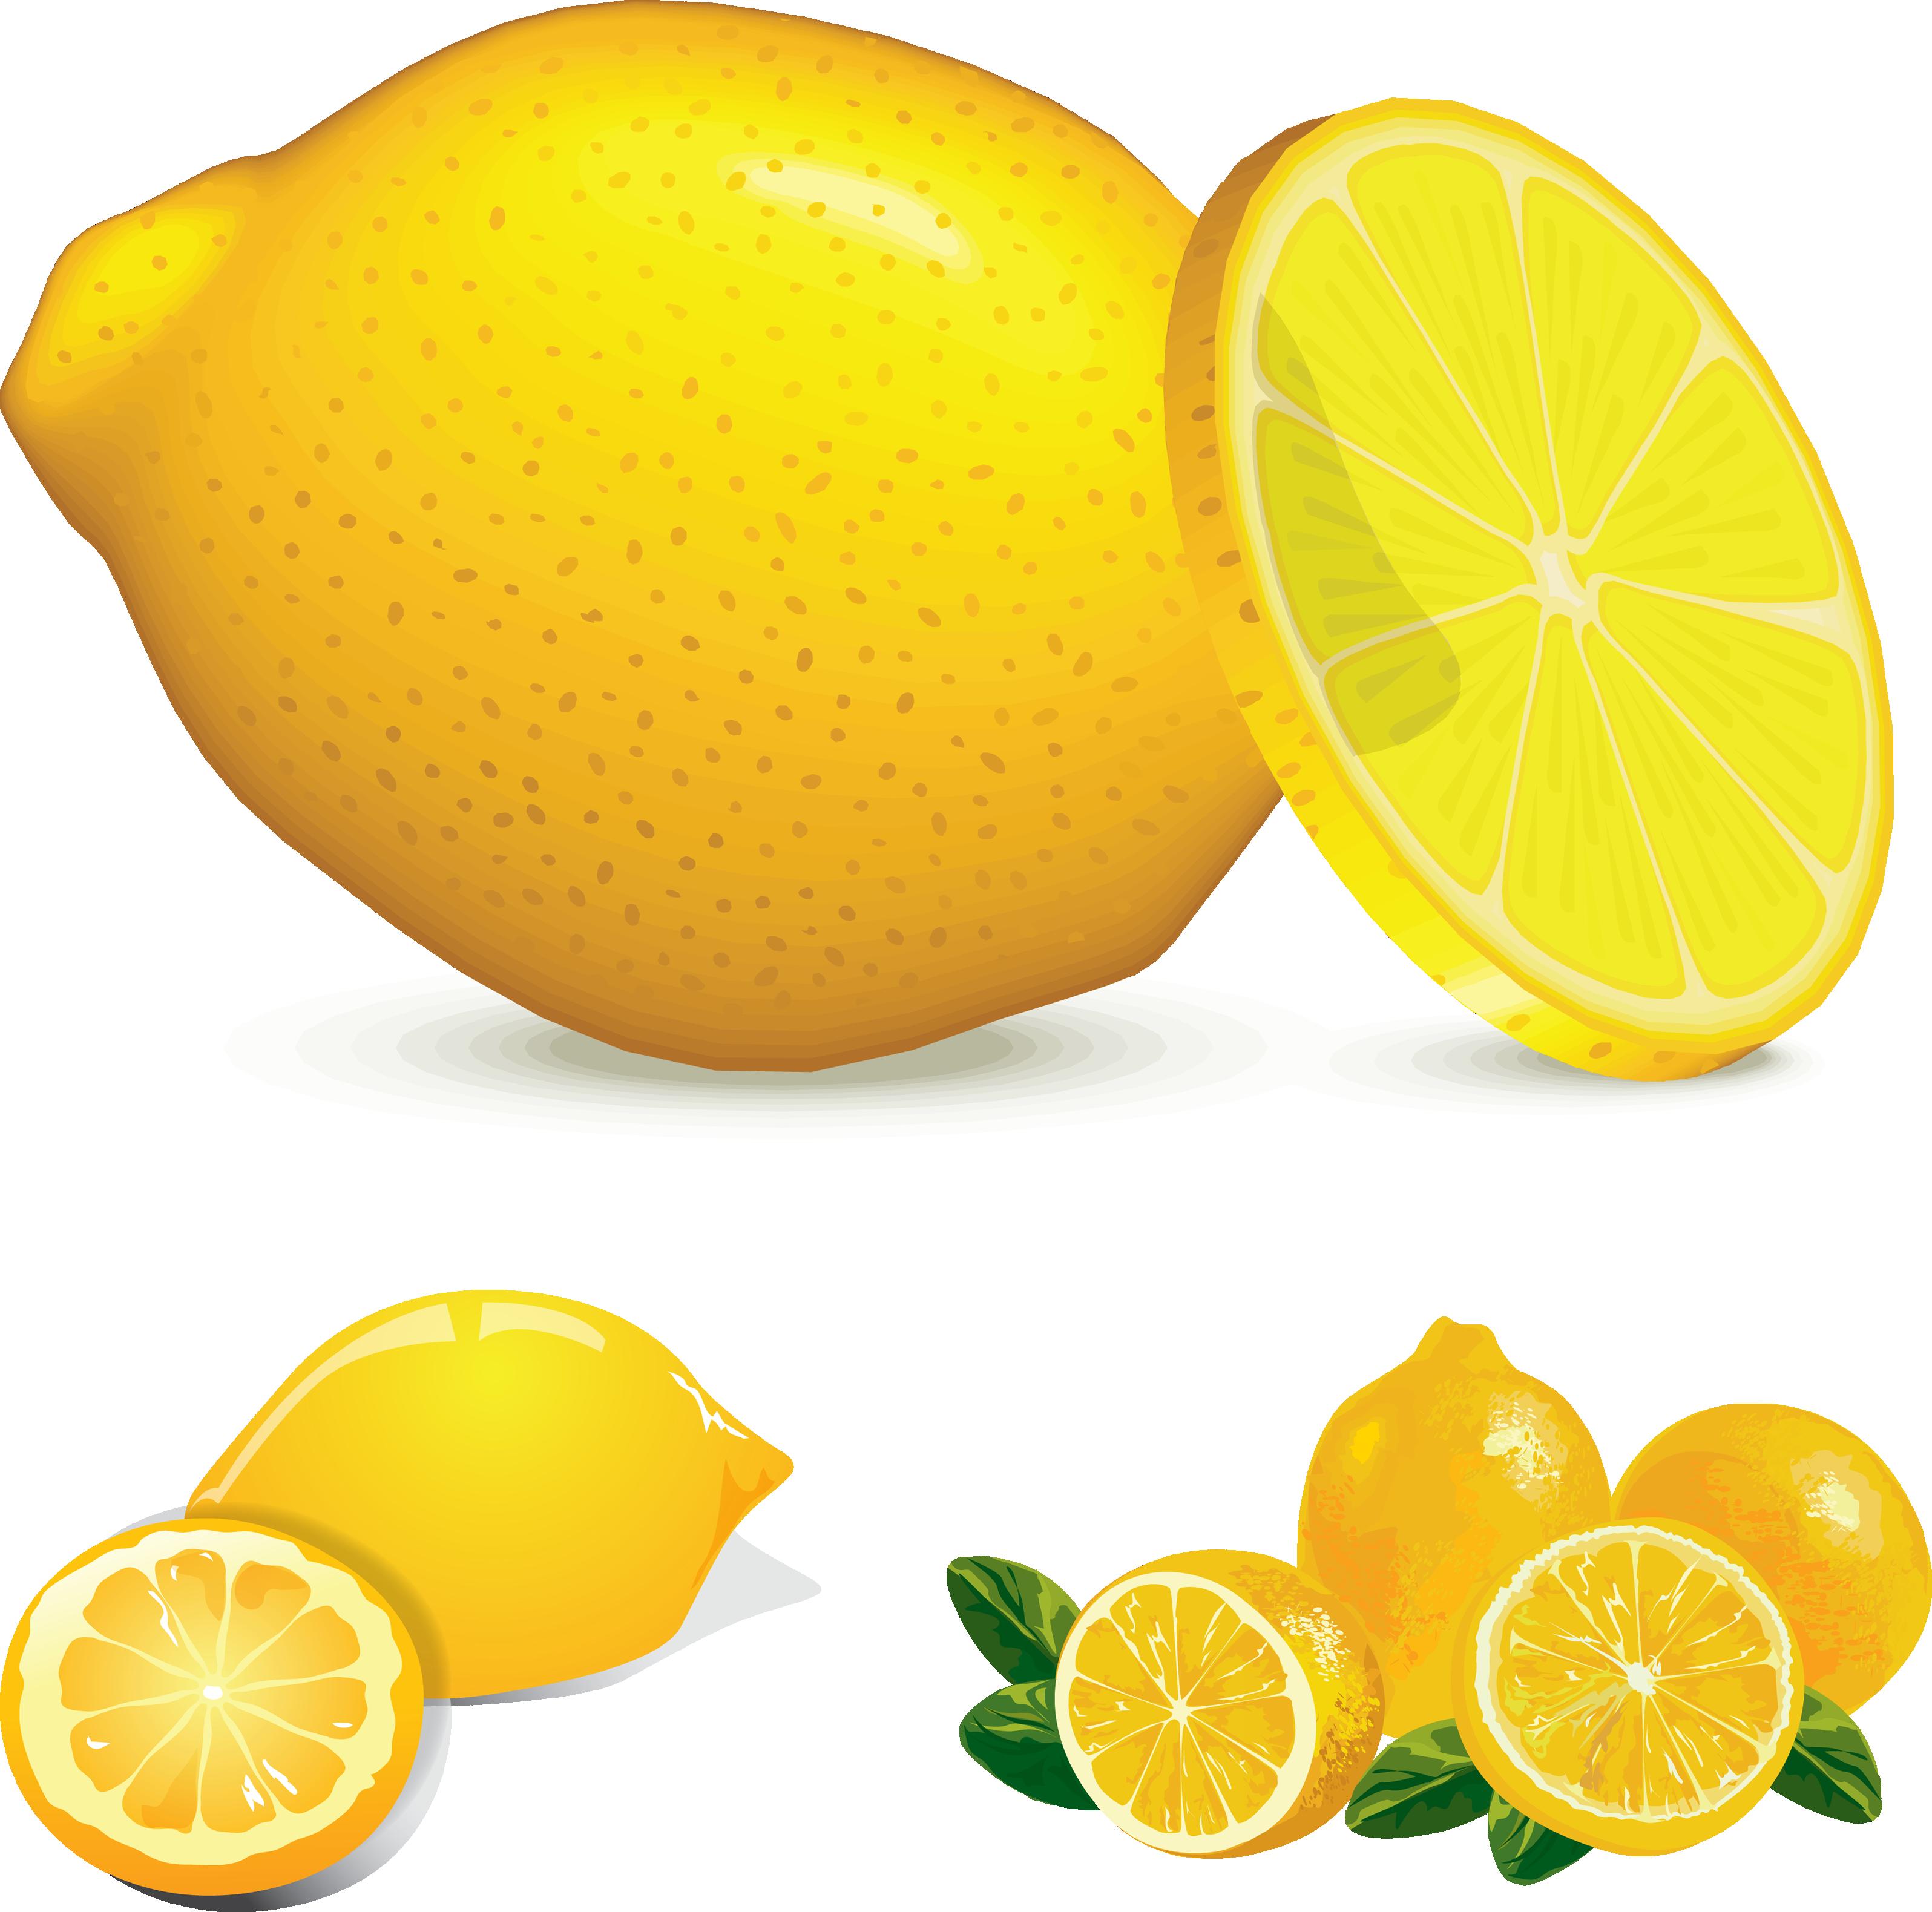 transparent download Lemons clipart lemon fruit. Png image purepng free.